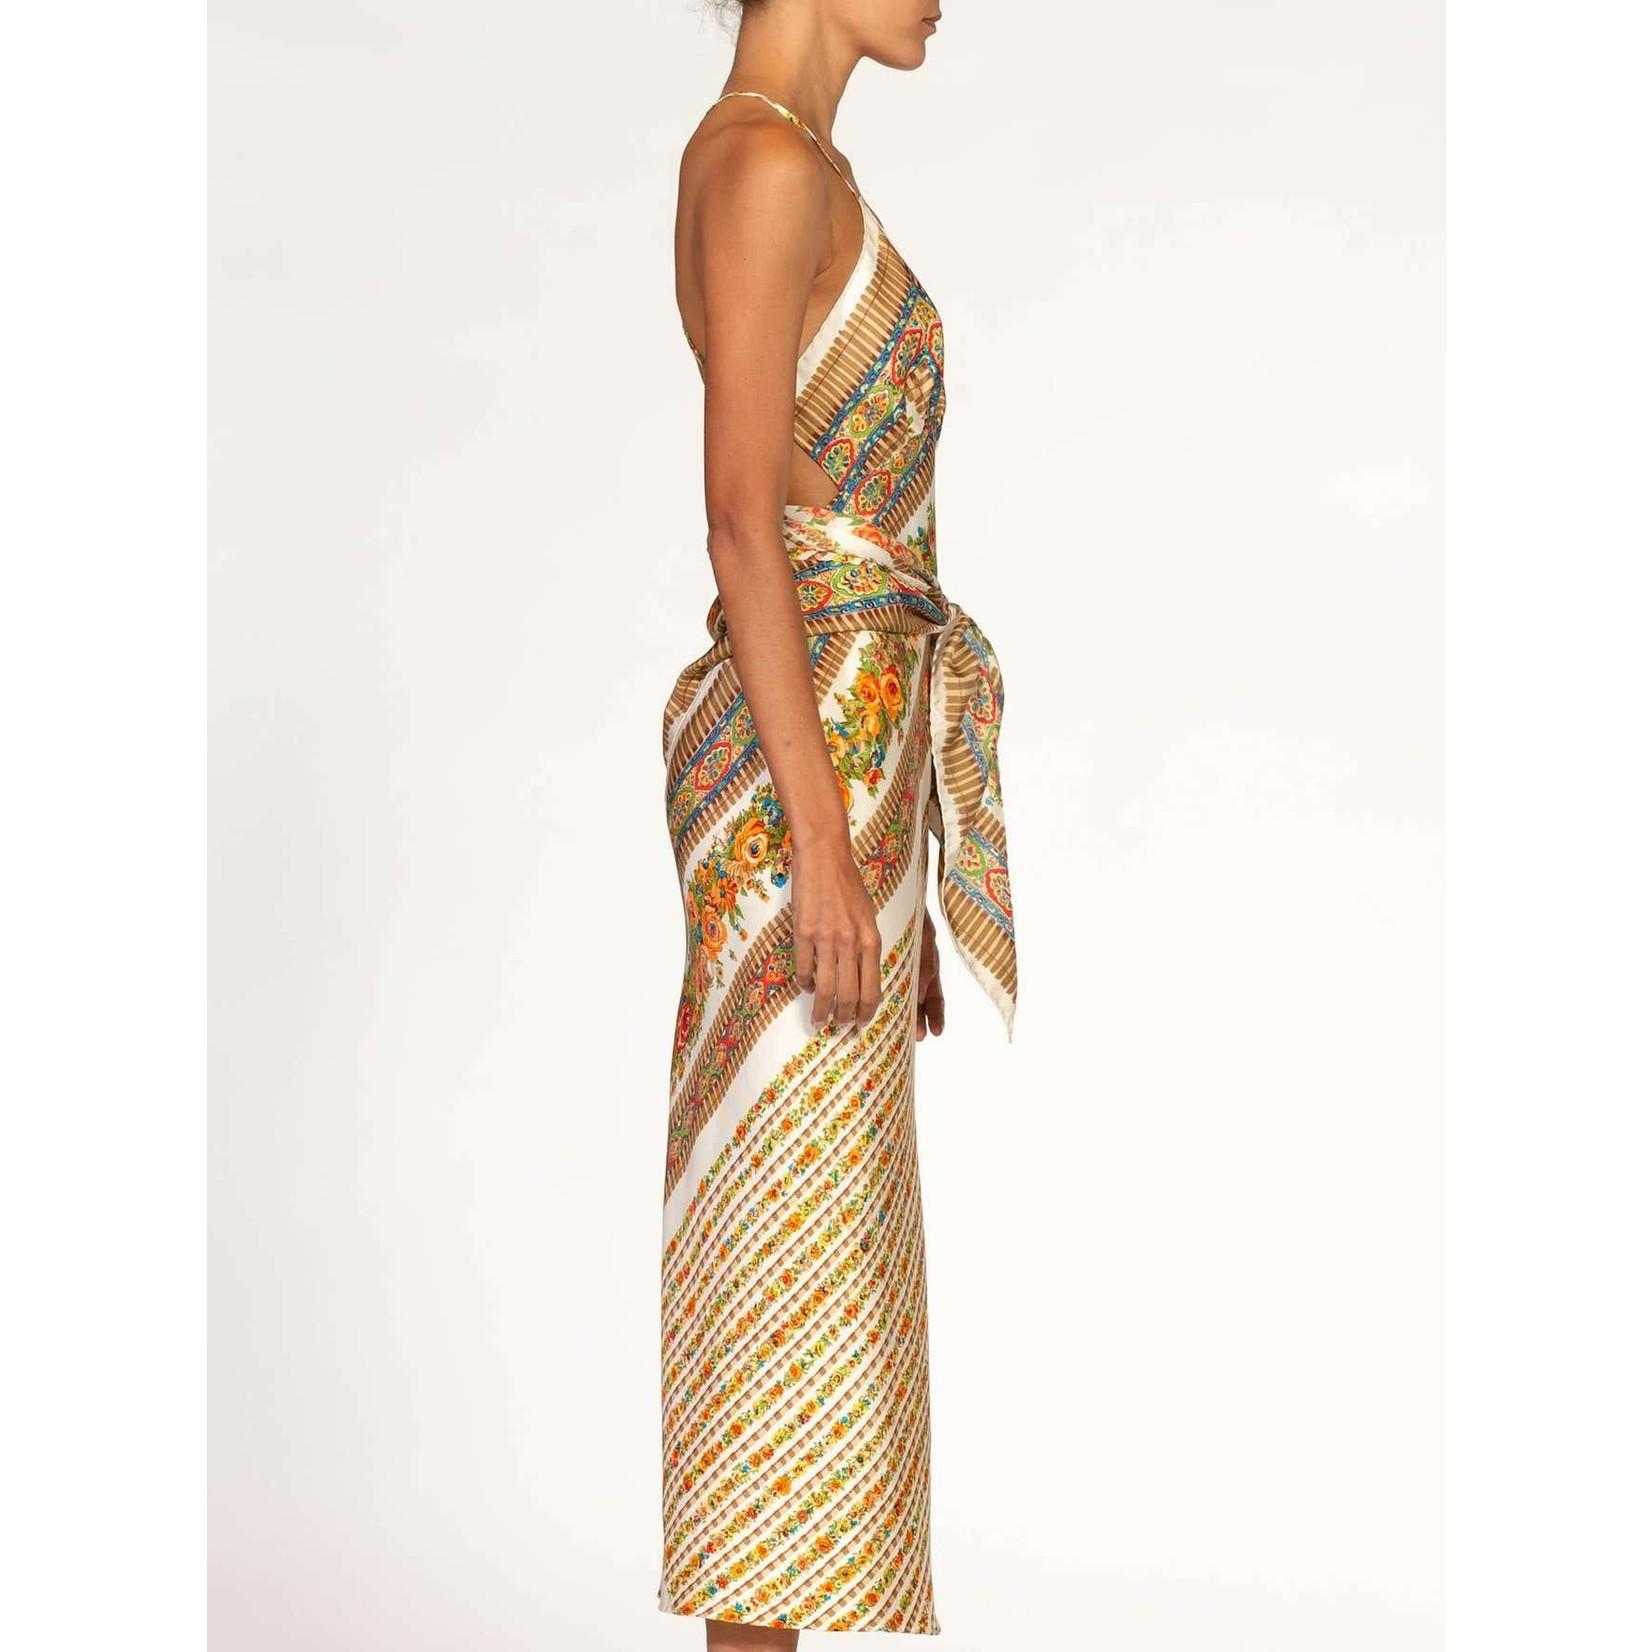 Morphew Cream & Earthtones Sagittarius Multi-Way Scarf Dress